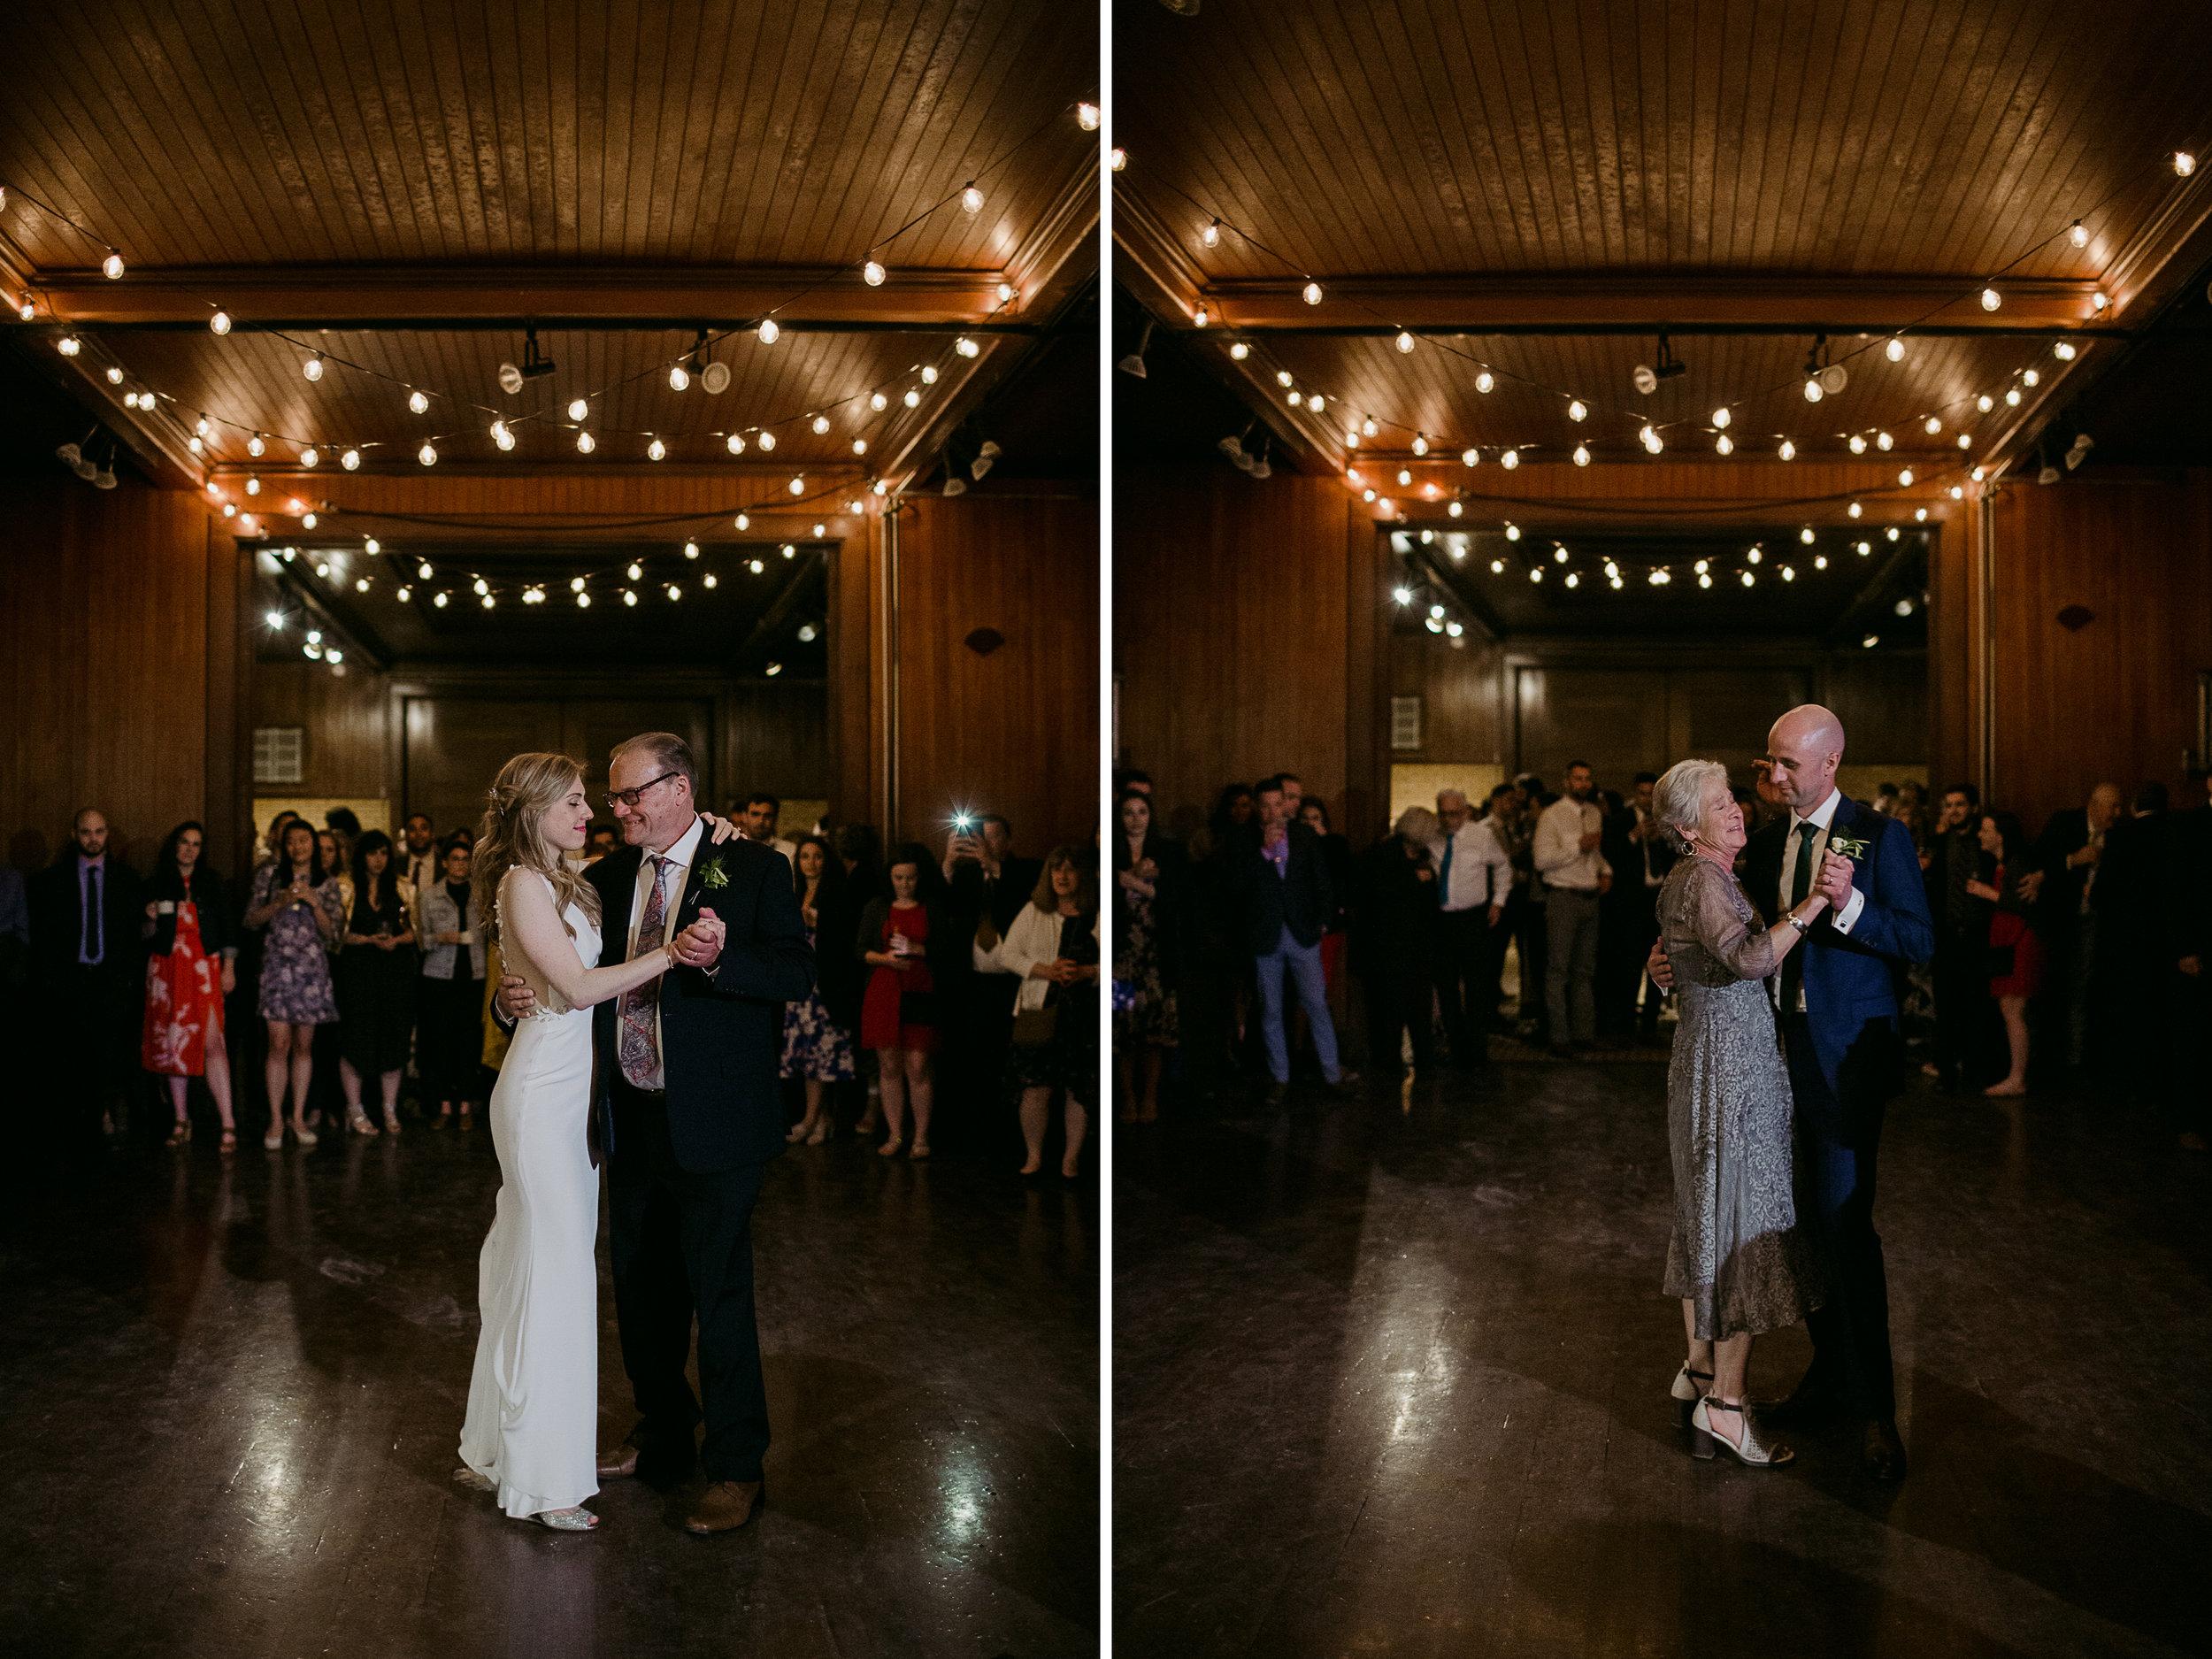 Shelburne_Farms_wedding_Vermont_Leah_Fisher-37.jpg